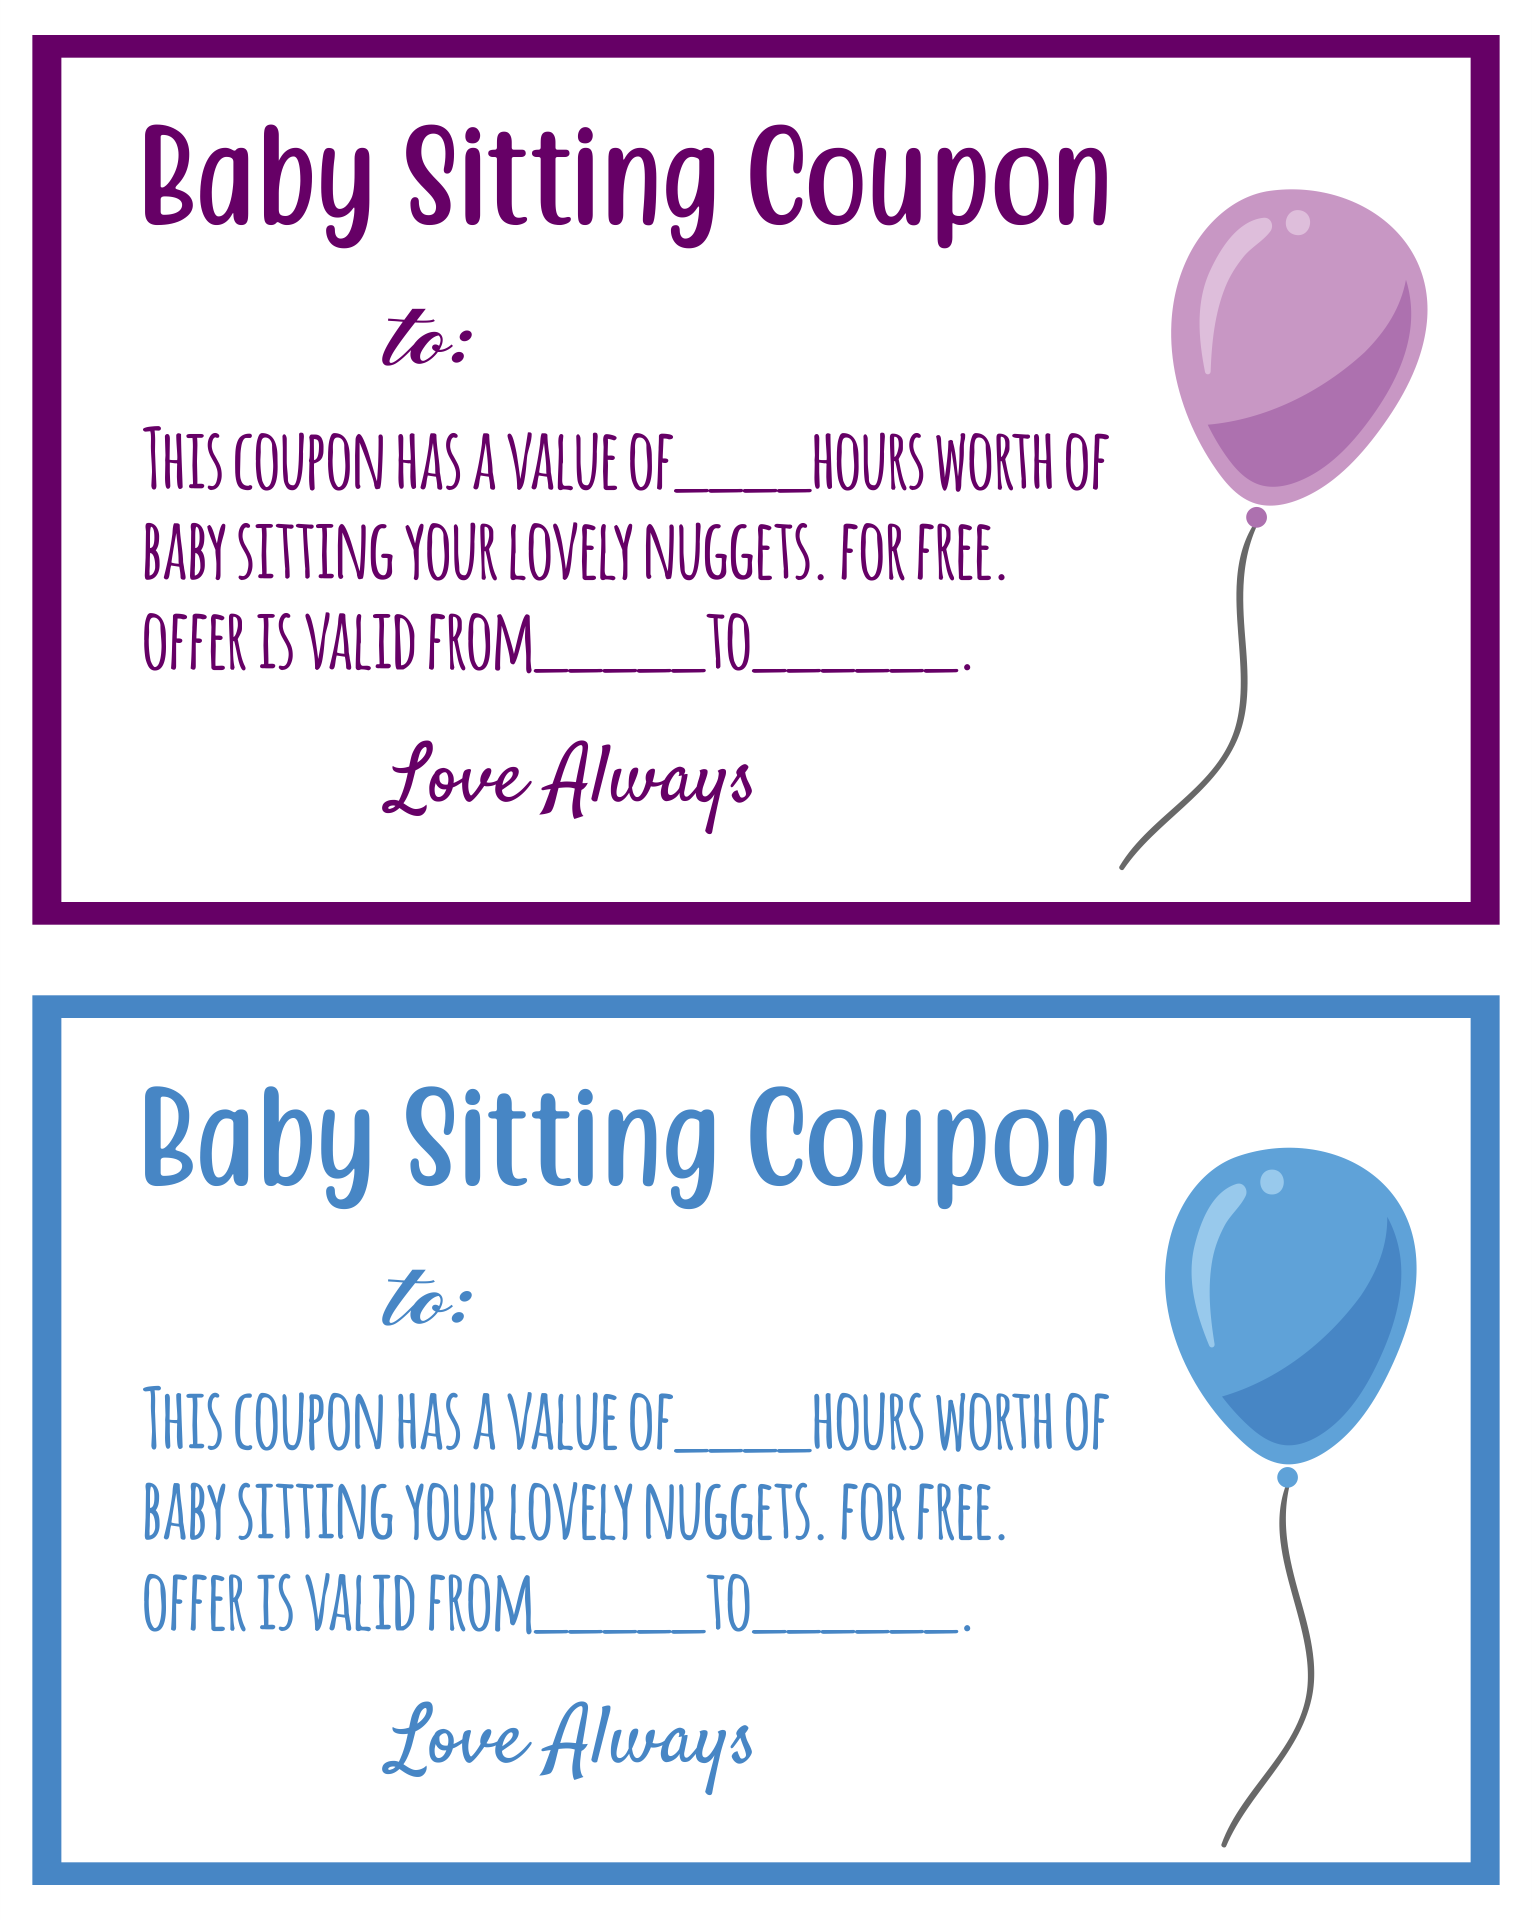 Free Babysitting Coupon Clip Art